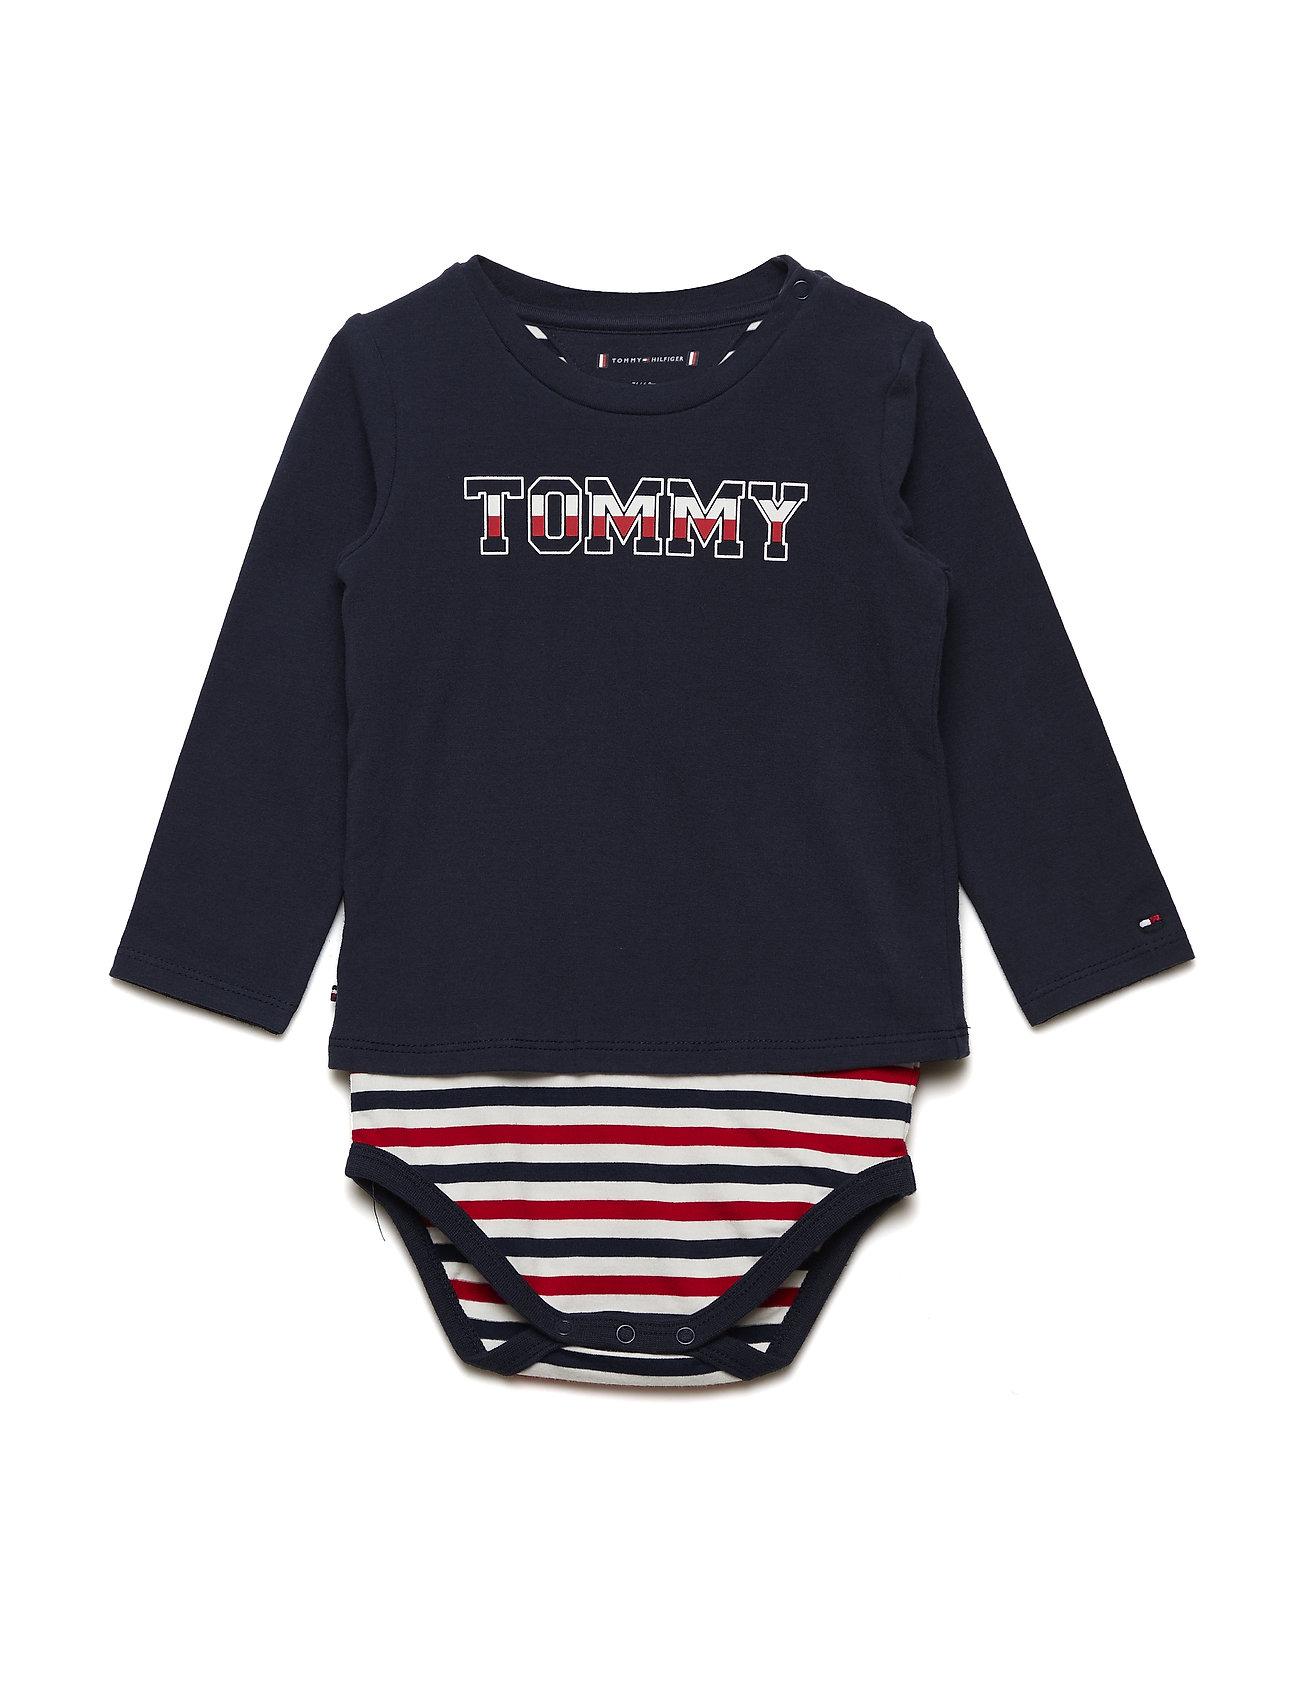 Tommy Hilfiger BABY BOY T-SHIRT BODY